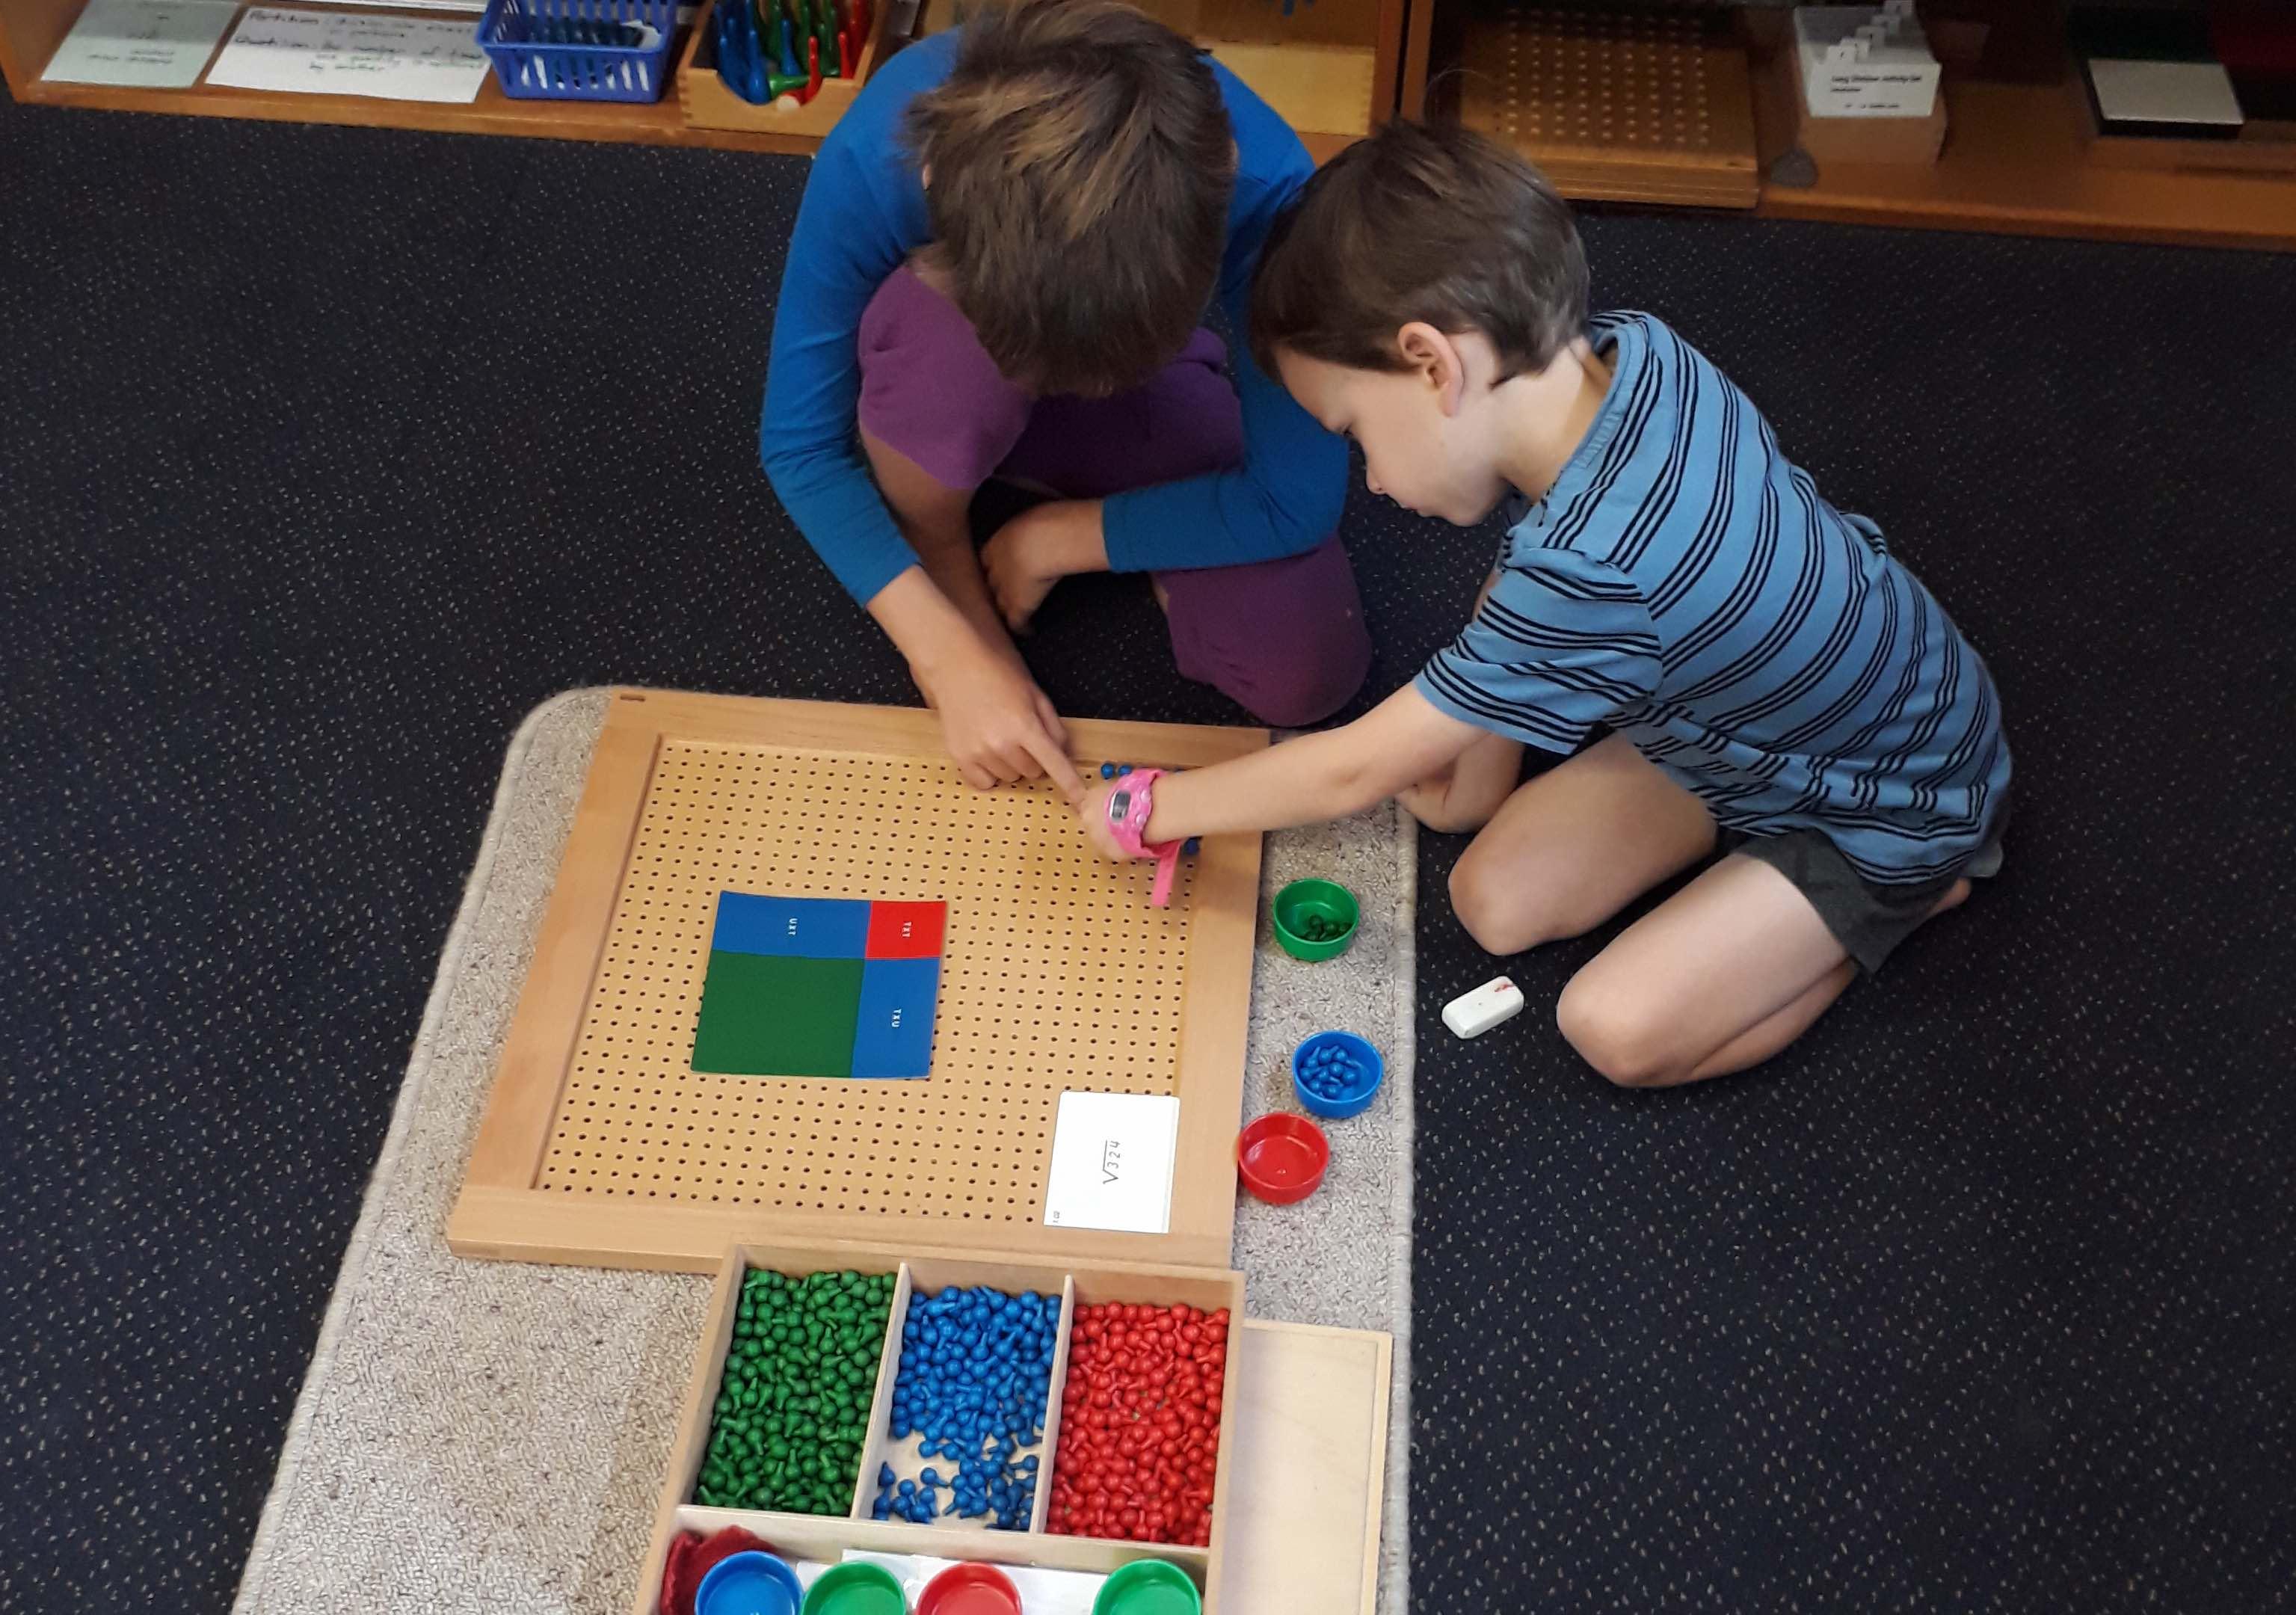 Montessori maths mahi at Port Ahuriri Primary School